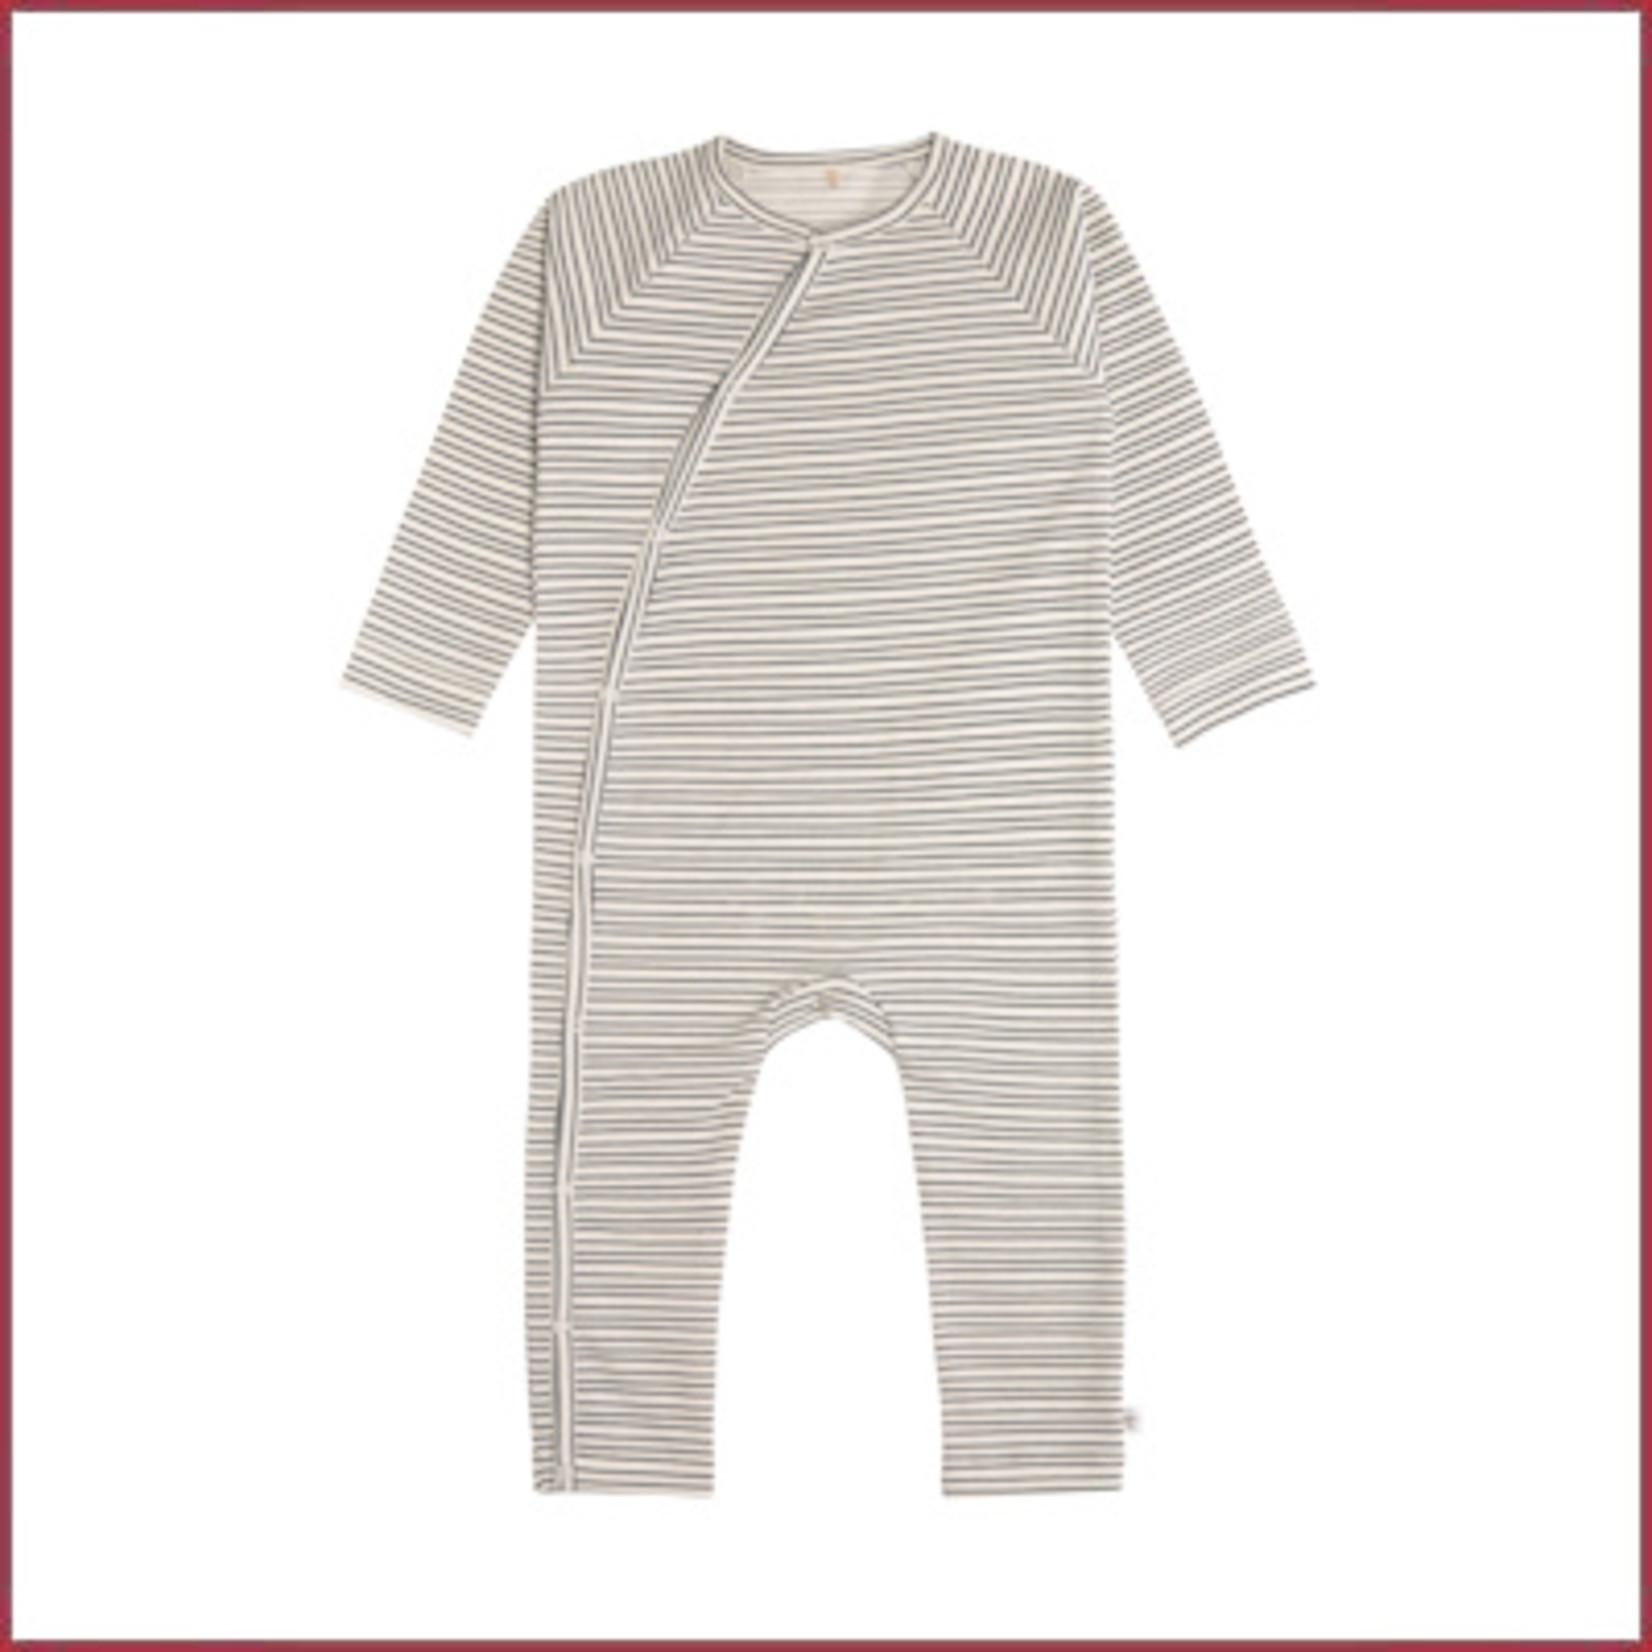 Lässig Boxpakje/pyjama GOTS gestreept grijs/anthracite